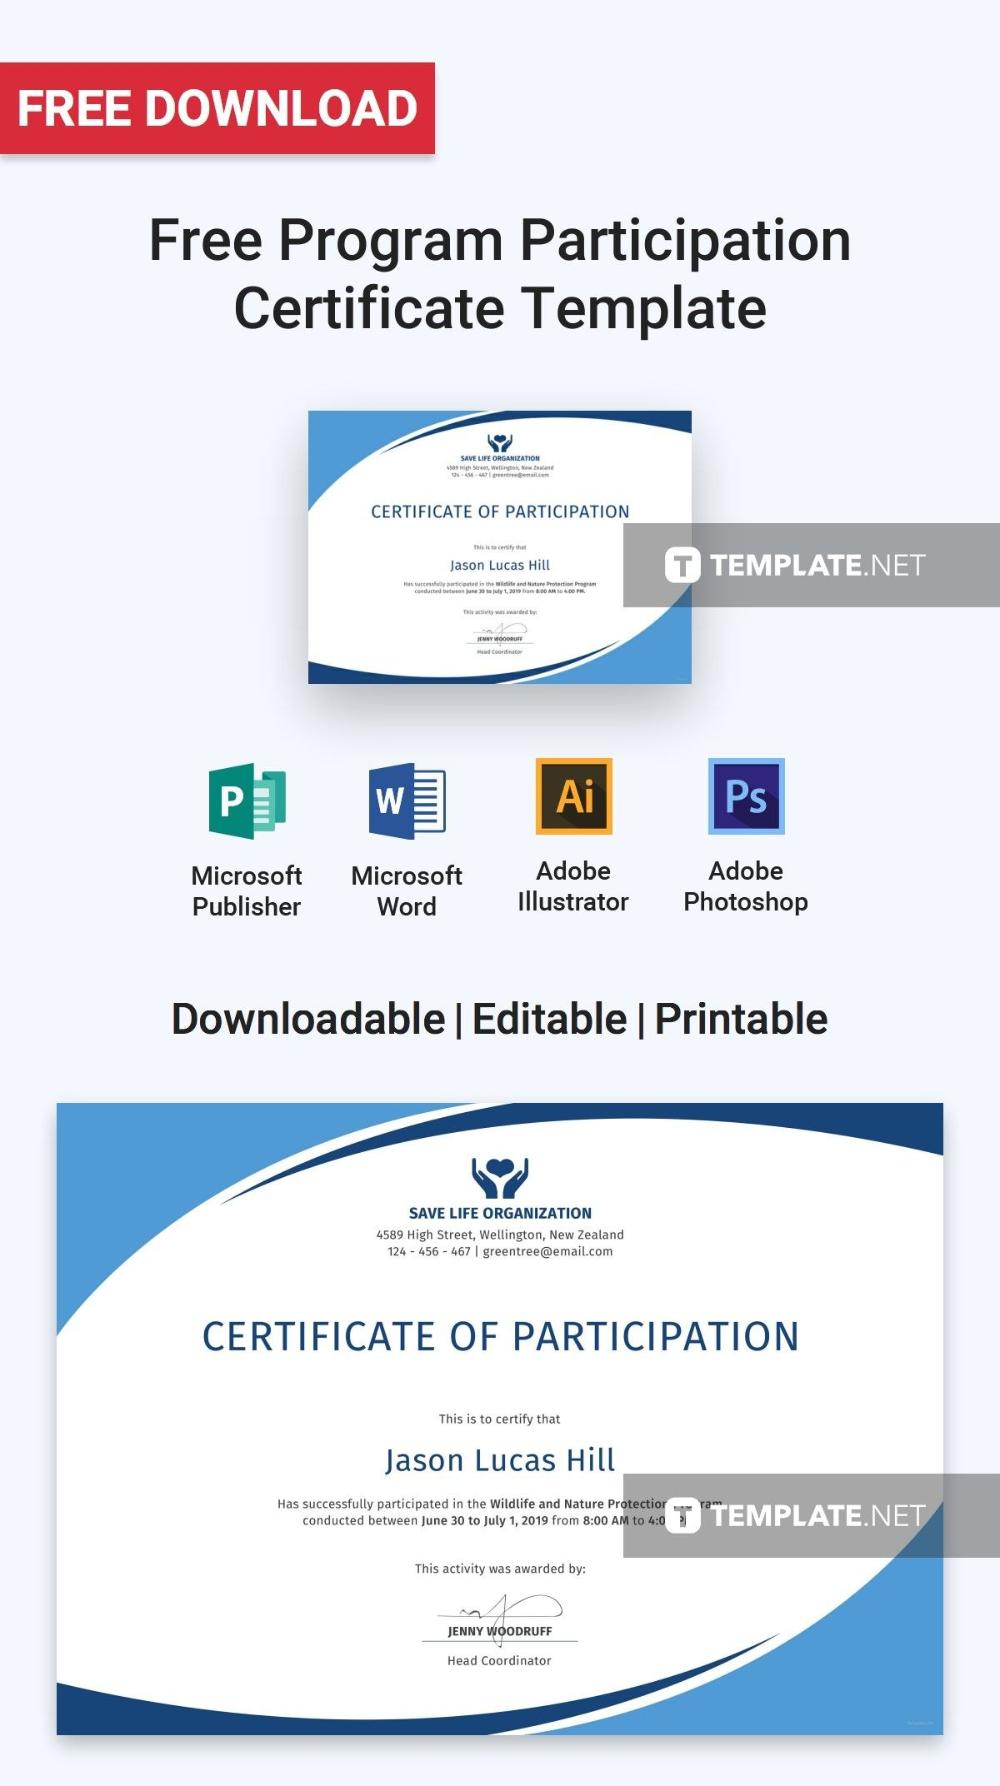 Free Program Participation Certificate Certificate Templates With Regar Certificate Templates Certificate Design Template Certificate Of Participation Template